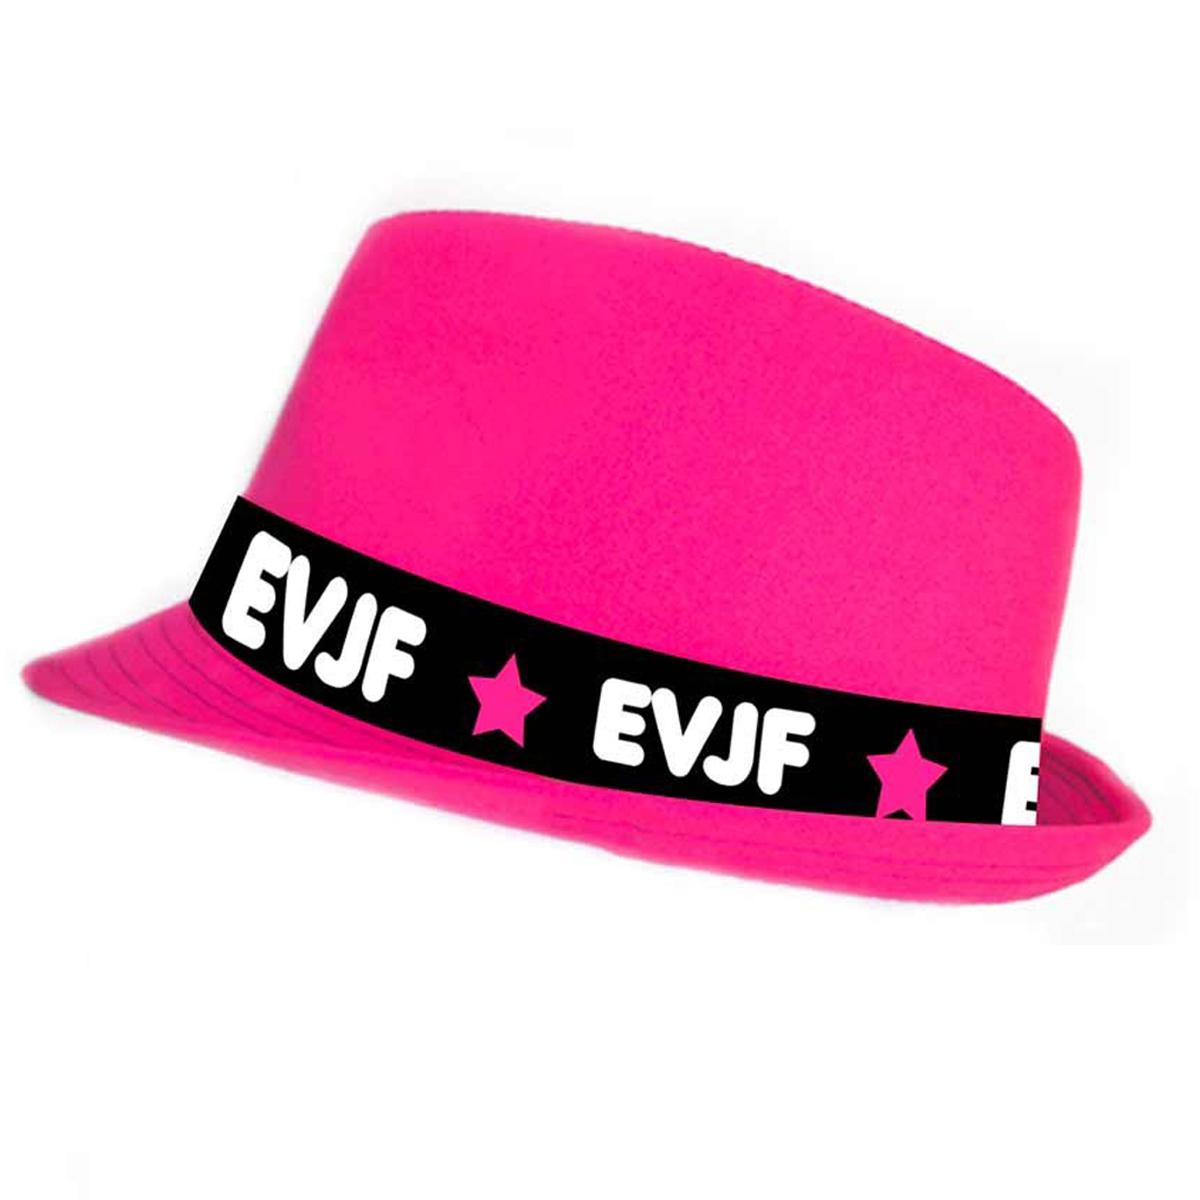 Chapeau Borsalino \'EVJF\' rose - taille unique - [Q6919]